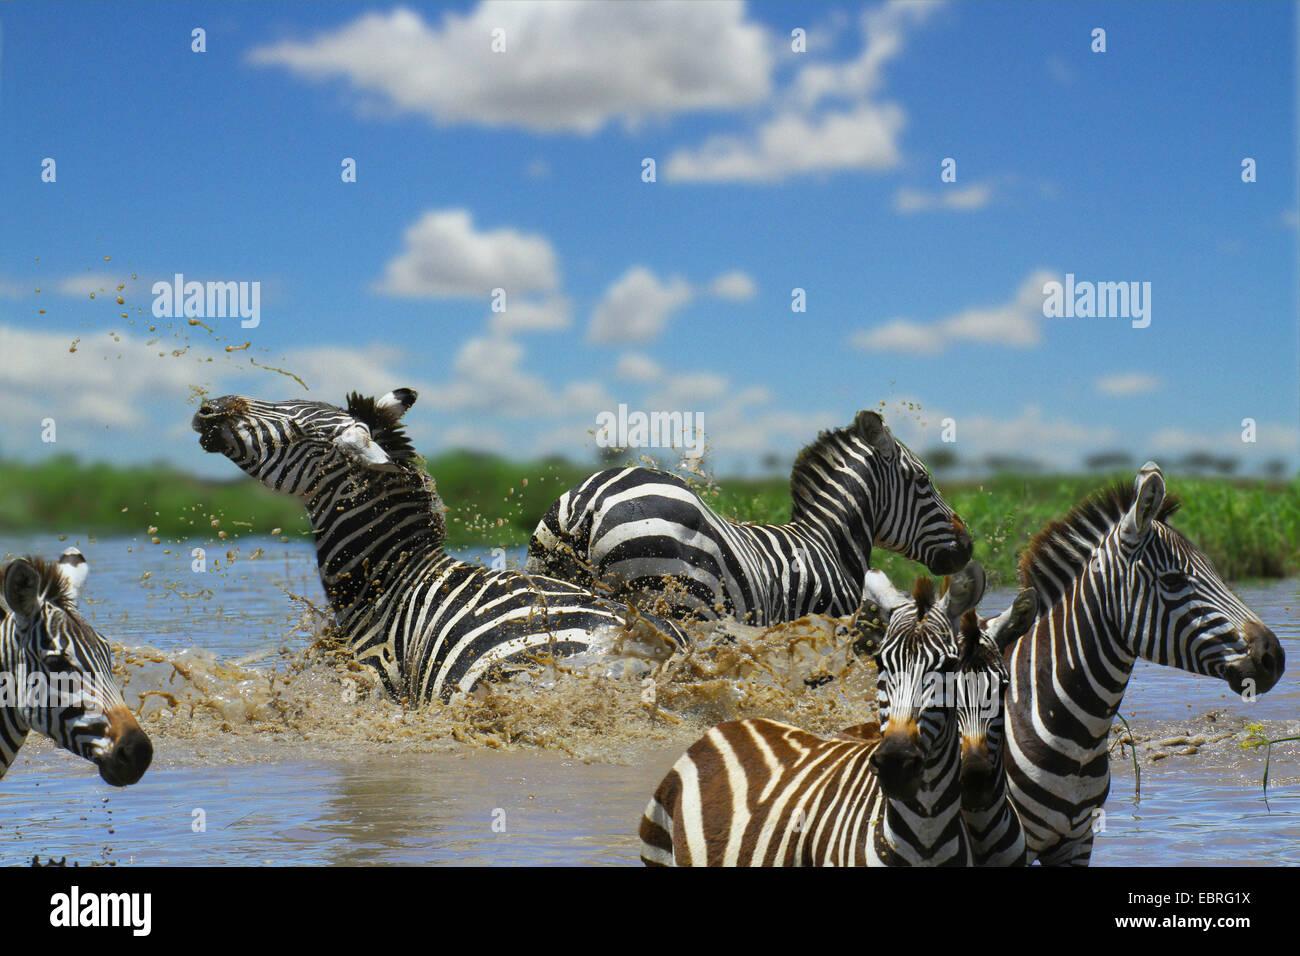 Zebra comune (Equus quagga), allevamento in acqua, lotta, Tanzania Serengeti National Park Immagini Stock